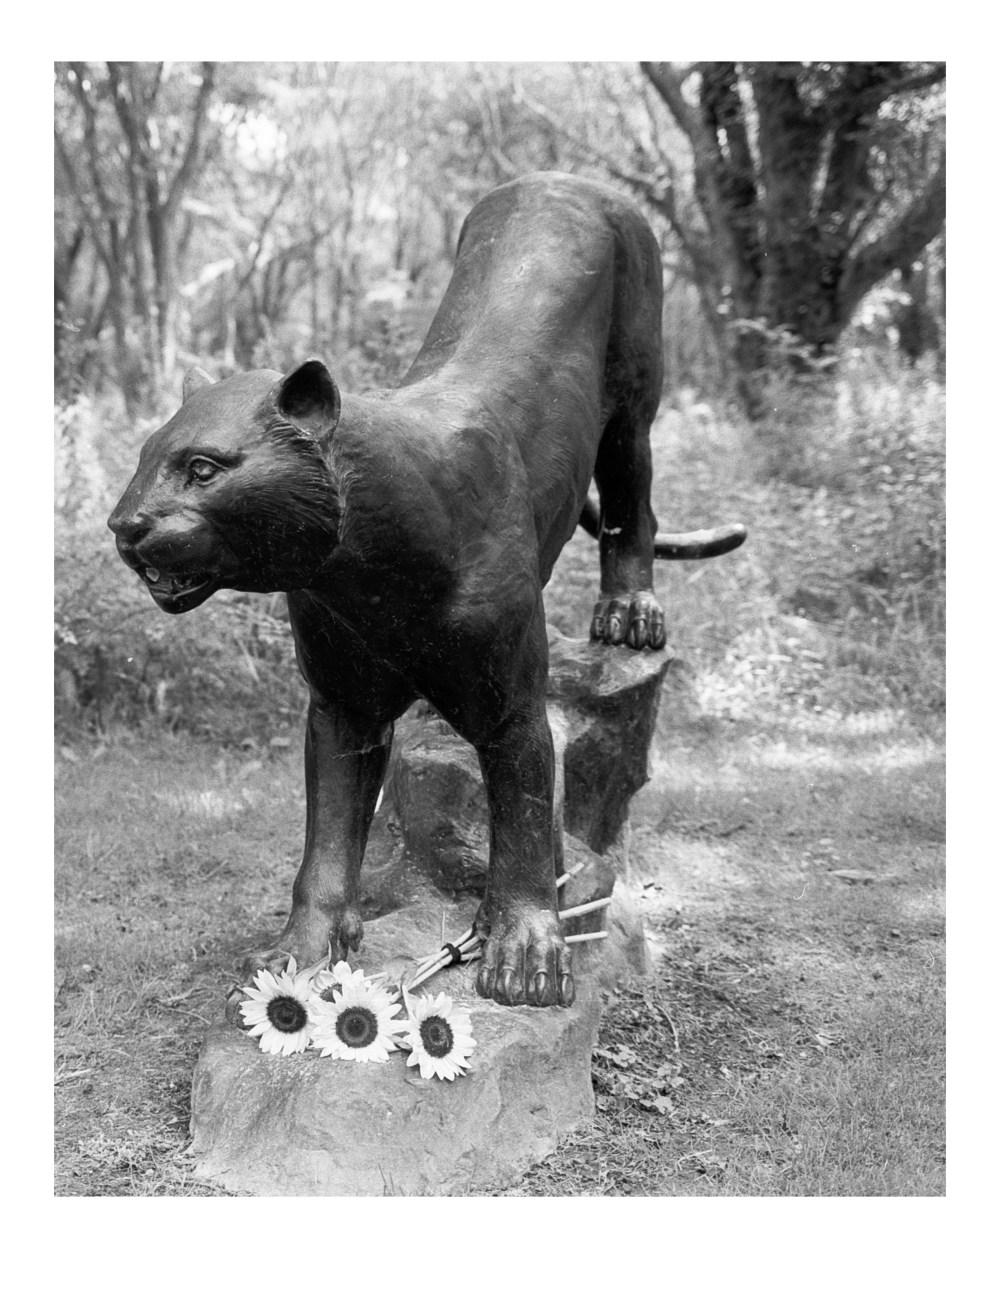 Lion in the Woods at Sakonnet Vineyard